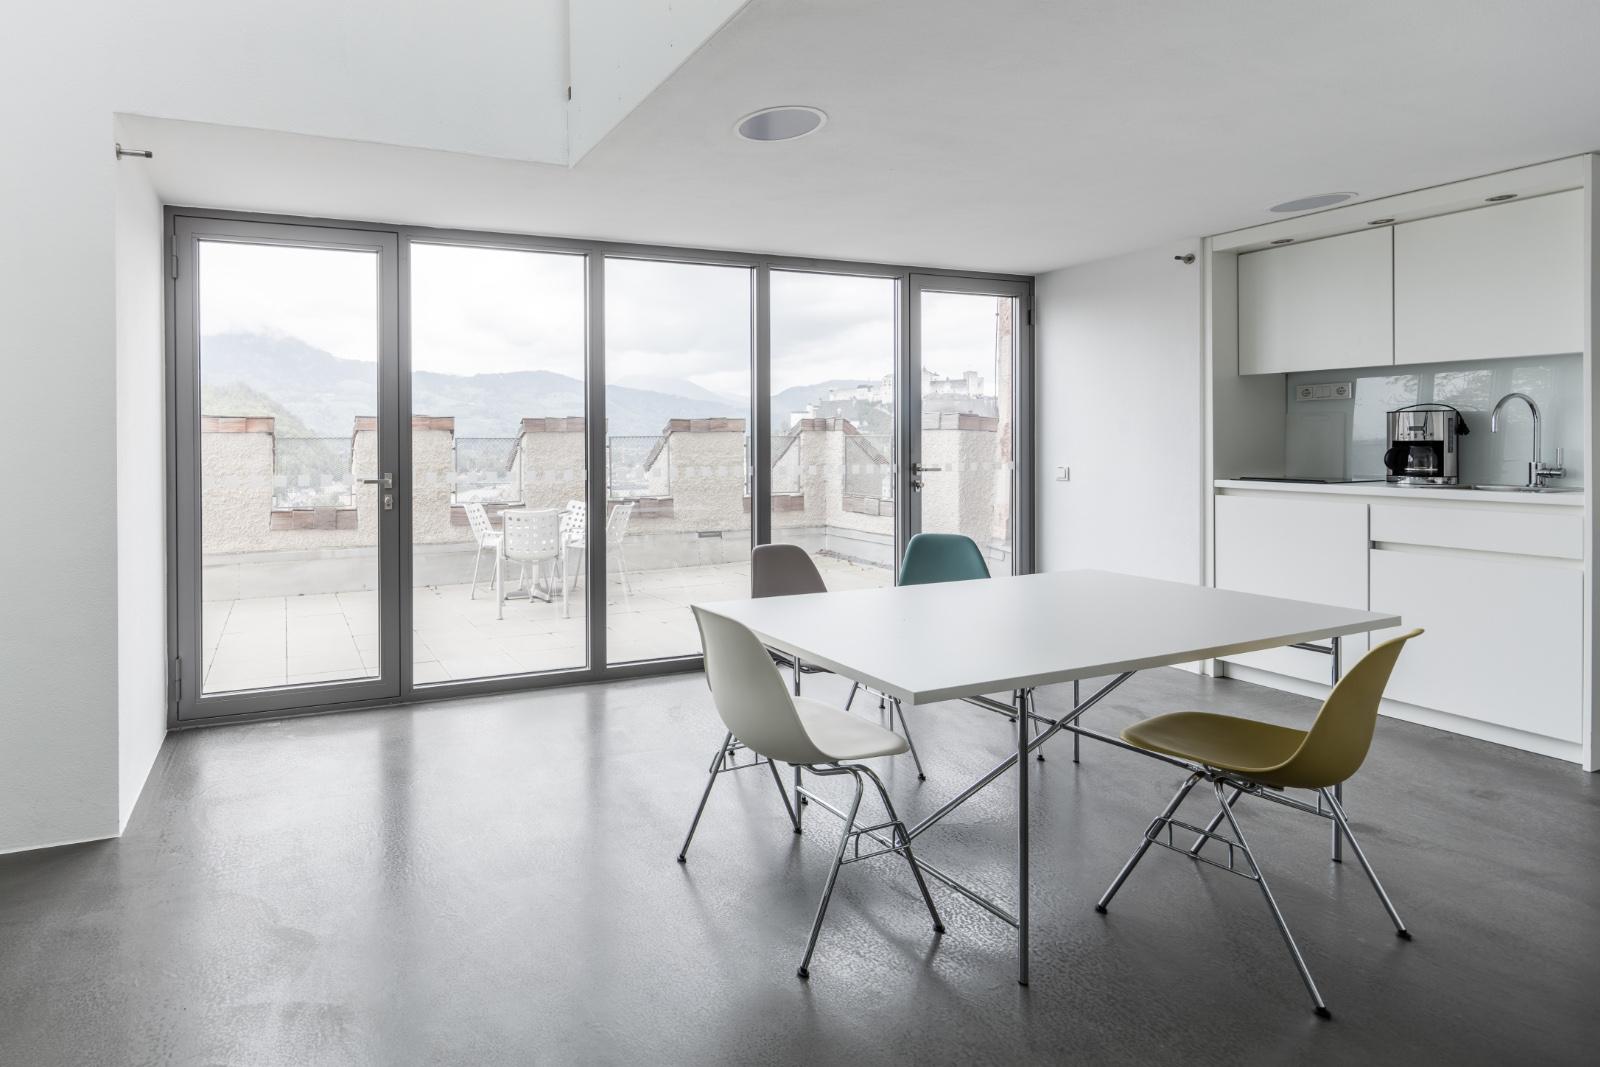 Studioraum mit Terrasse